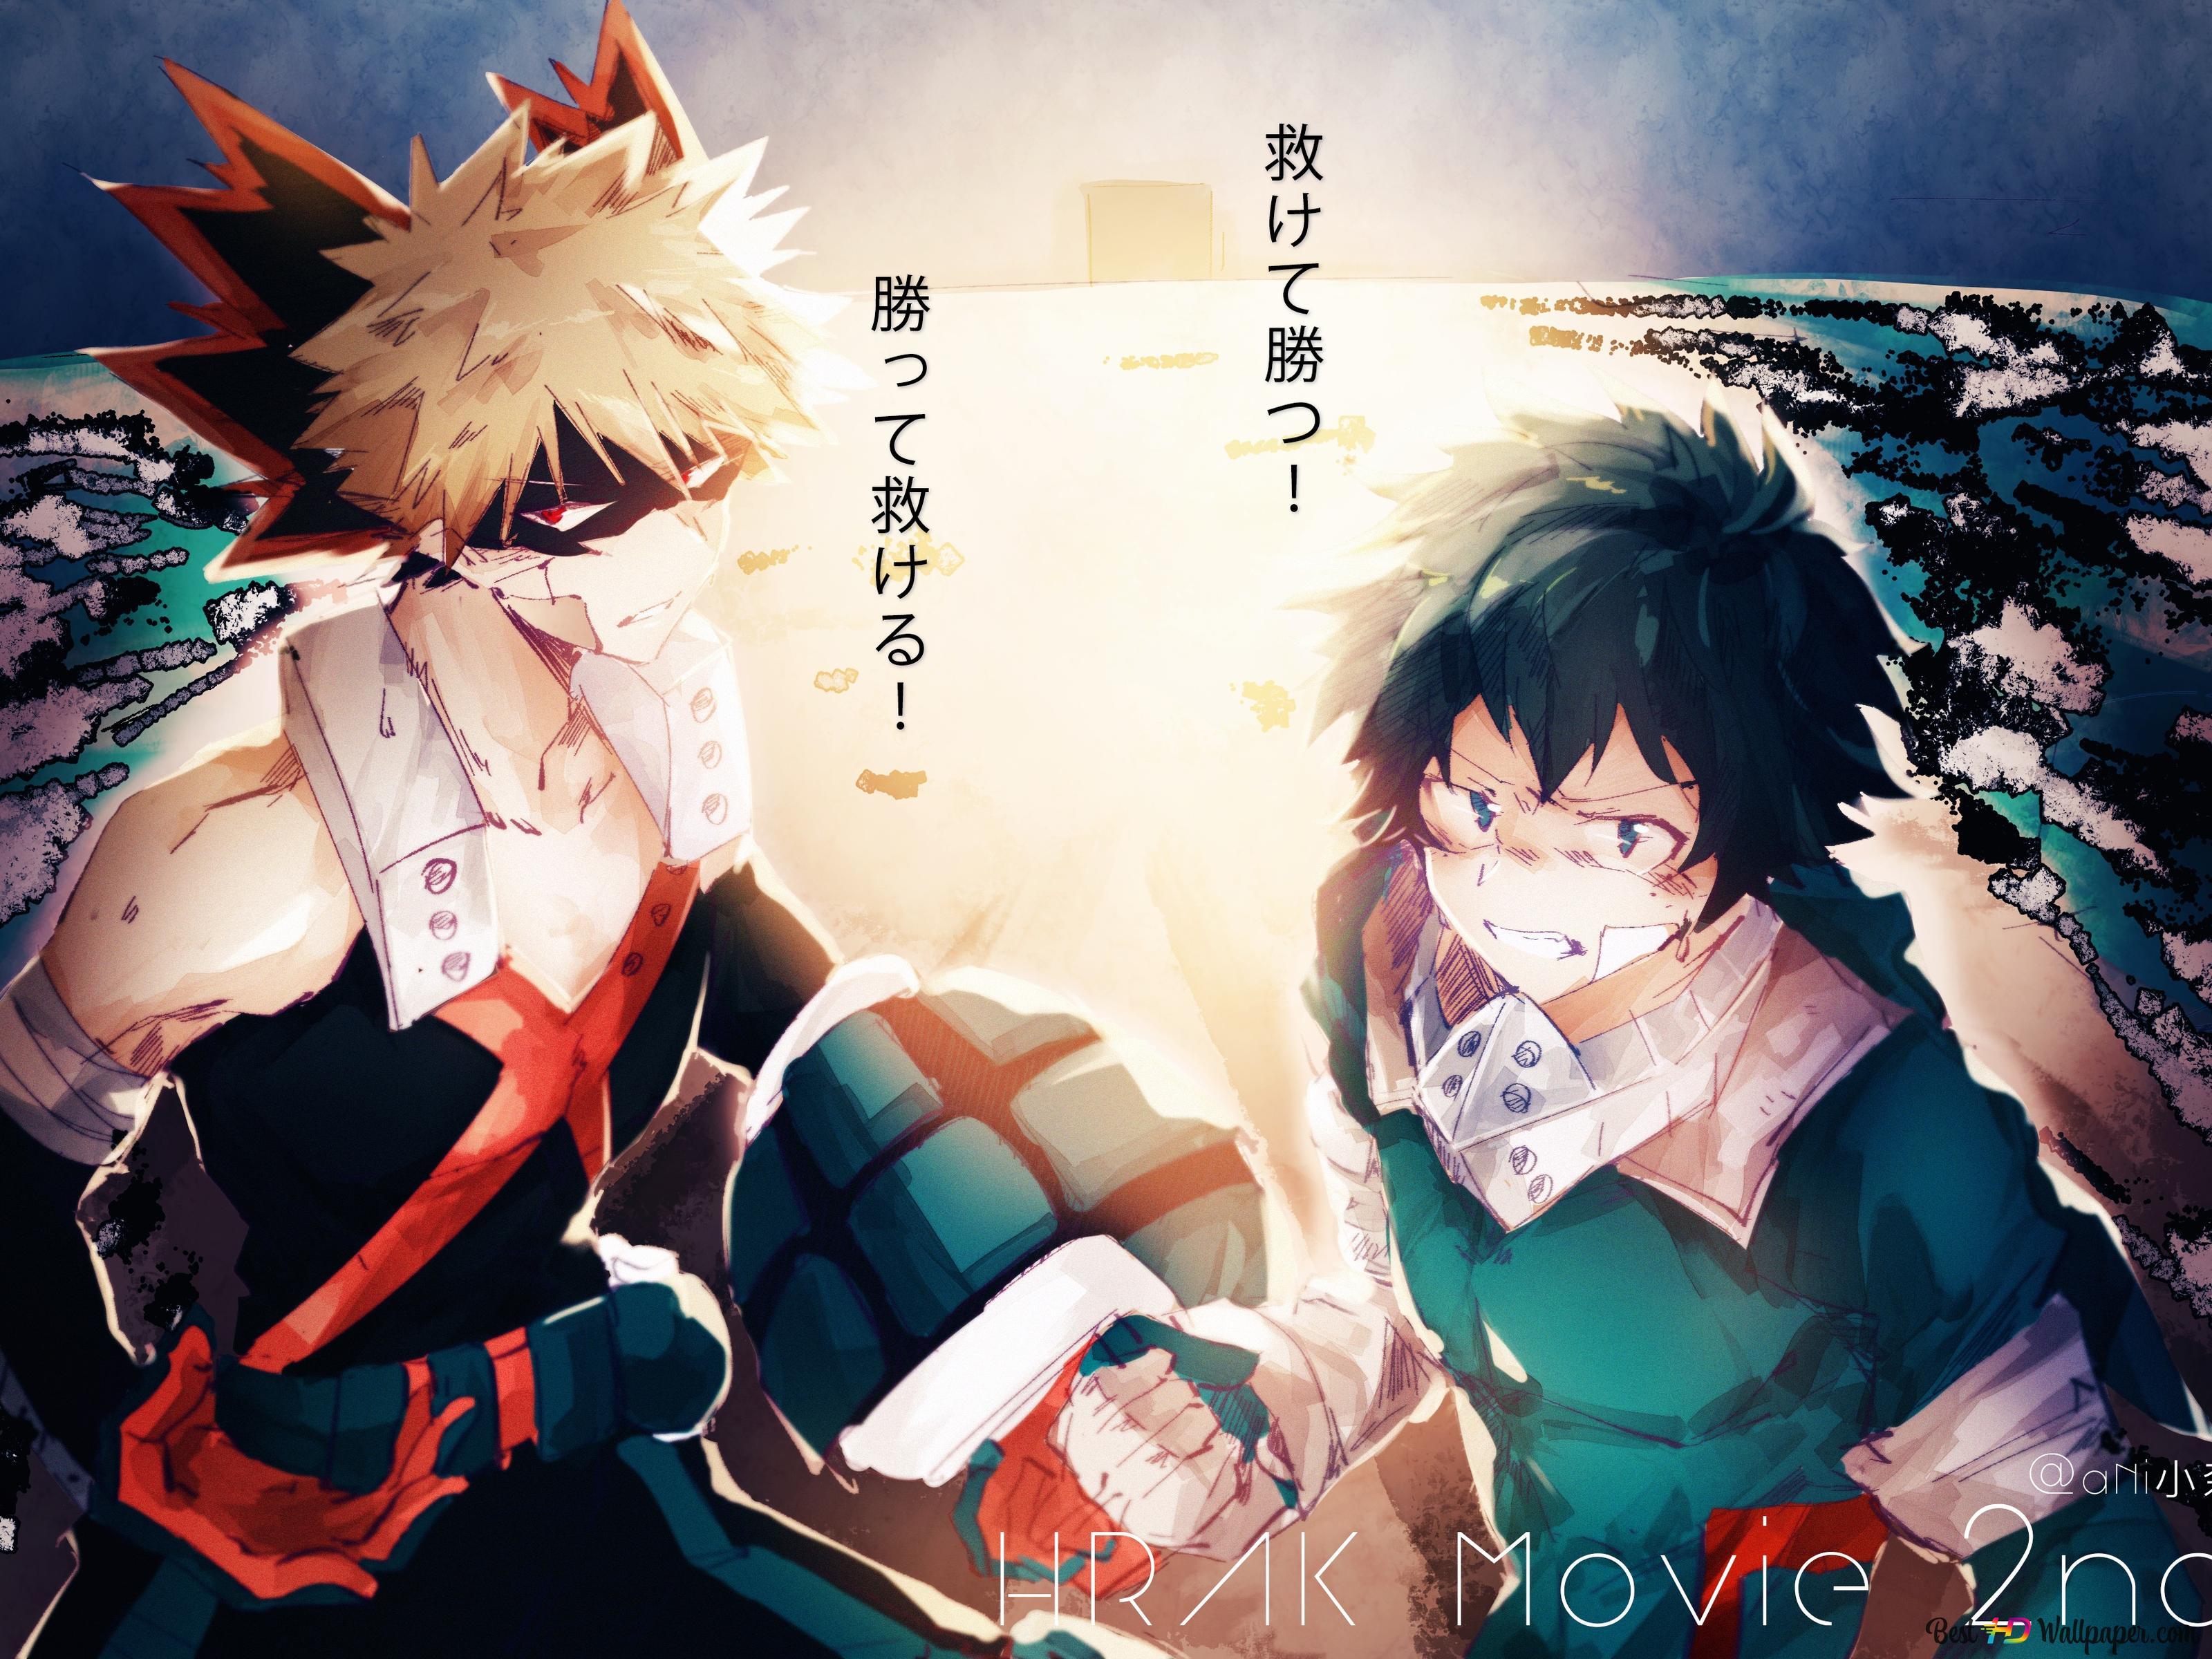 Deku Bakugo My Hero Academia Hd Wallpaper Download